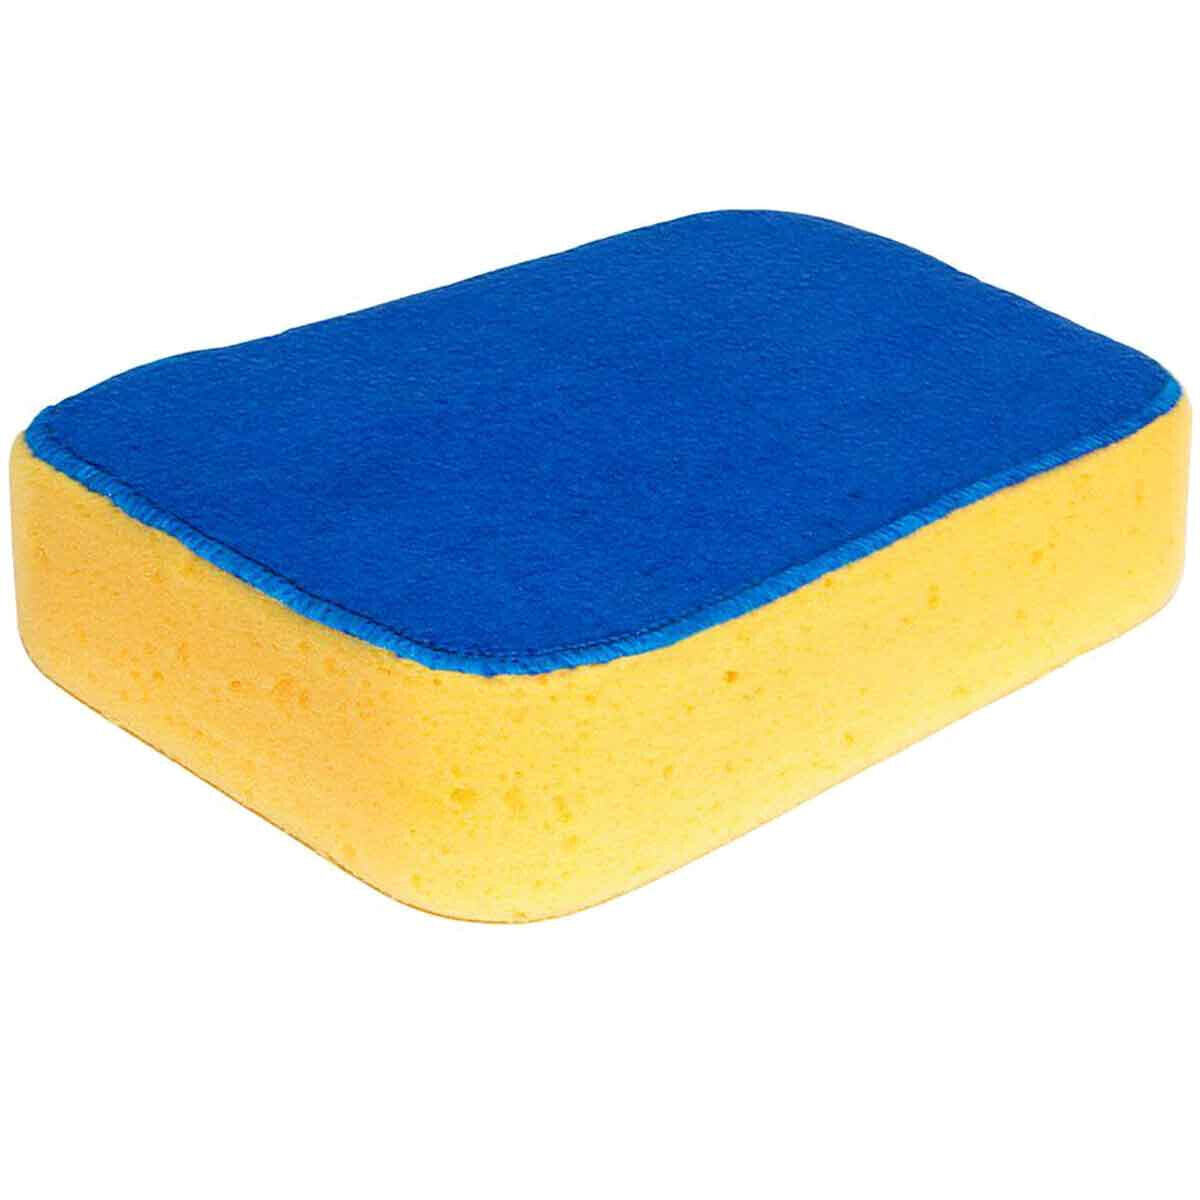 QEP 7-1/2 inch Microfiber Sponge